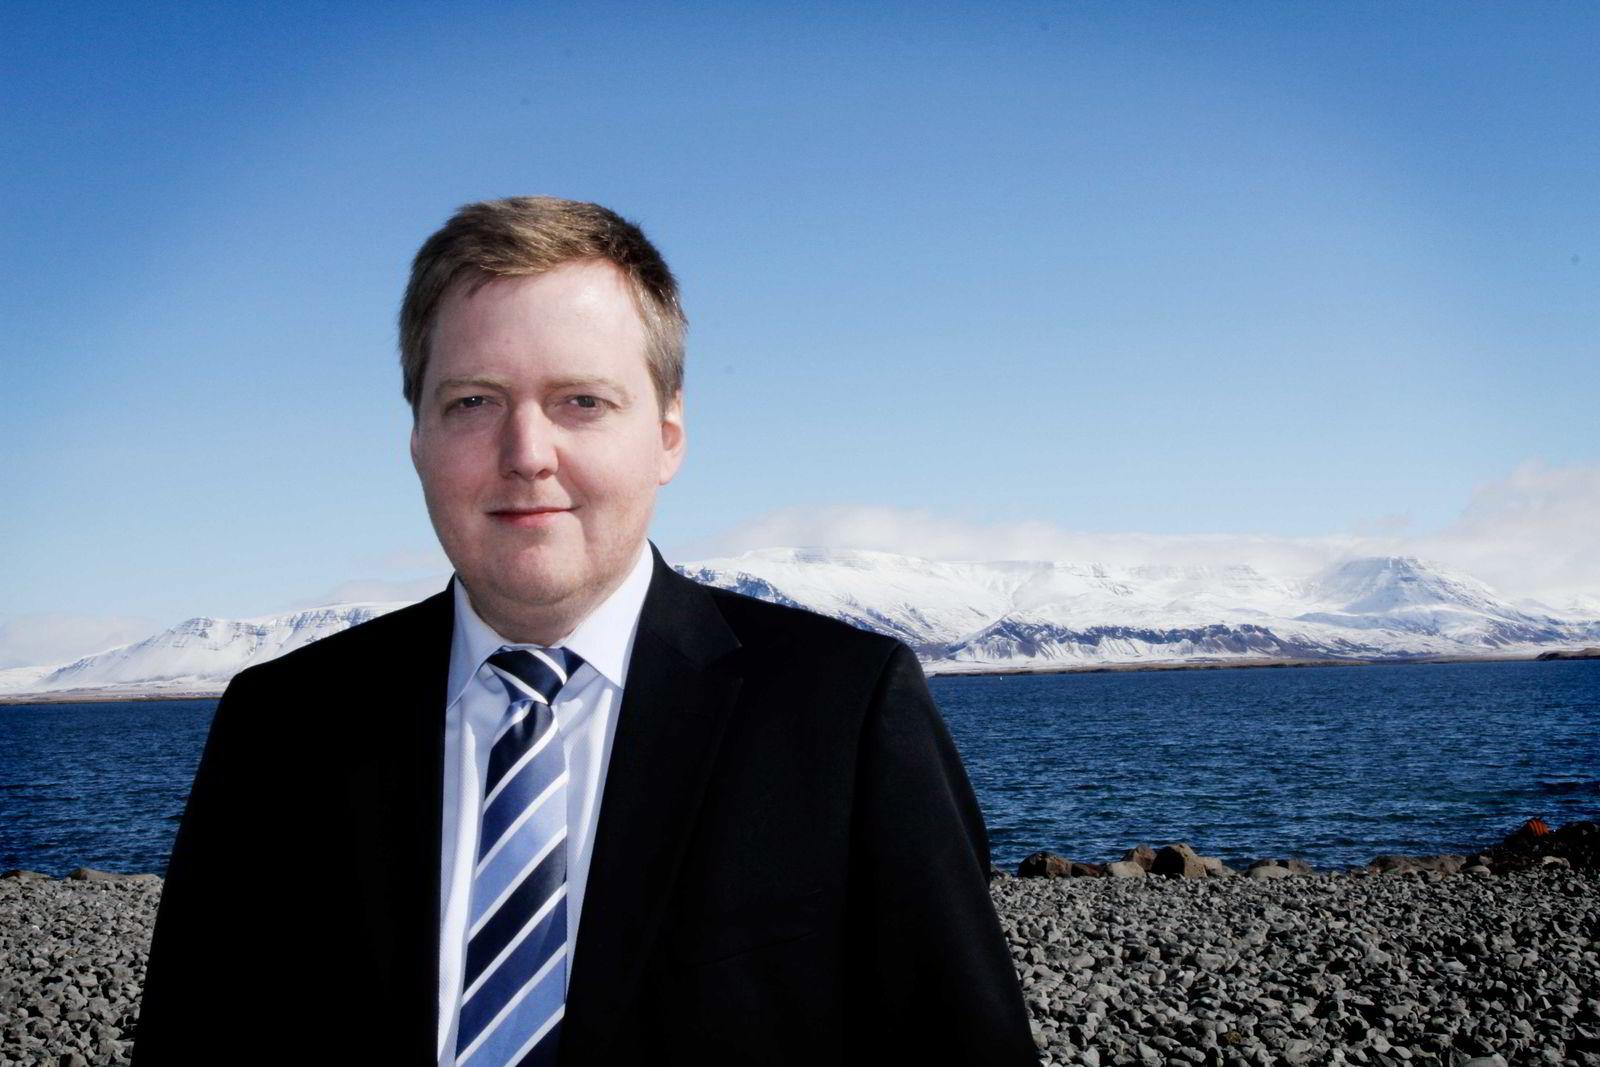 Sigmundur Davíd Gunnlaugsson, statsminister på Island. Foto: Anne Marte Vestbakke/